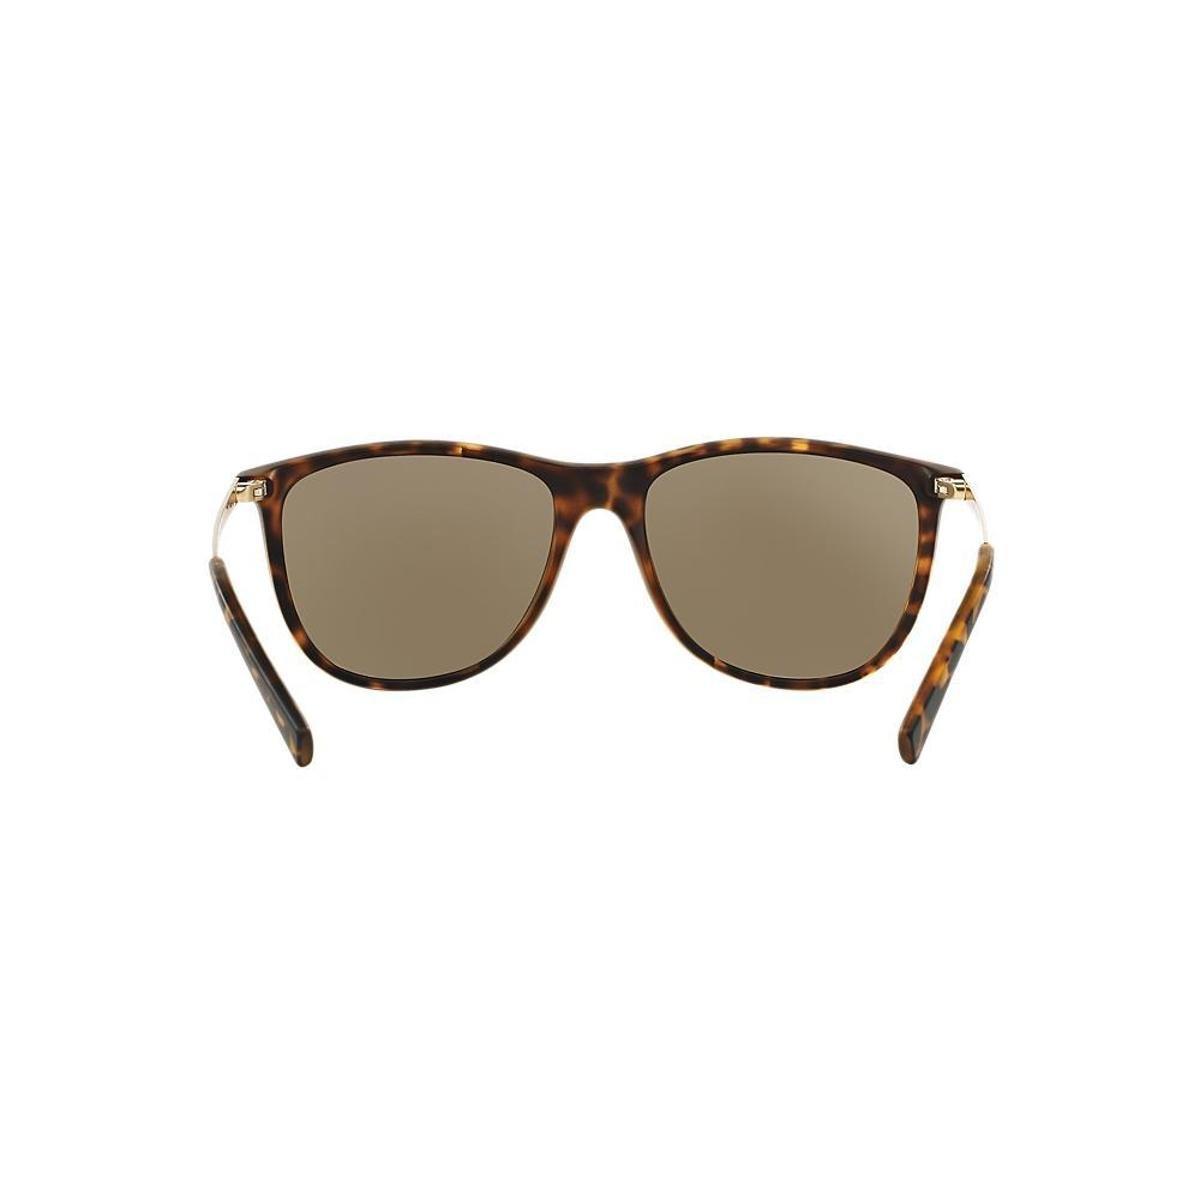 e9f73b13be1 Óculos de Sol Armani Exchange Quadrado AX4047SL Masculino - Marrom ...